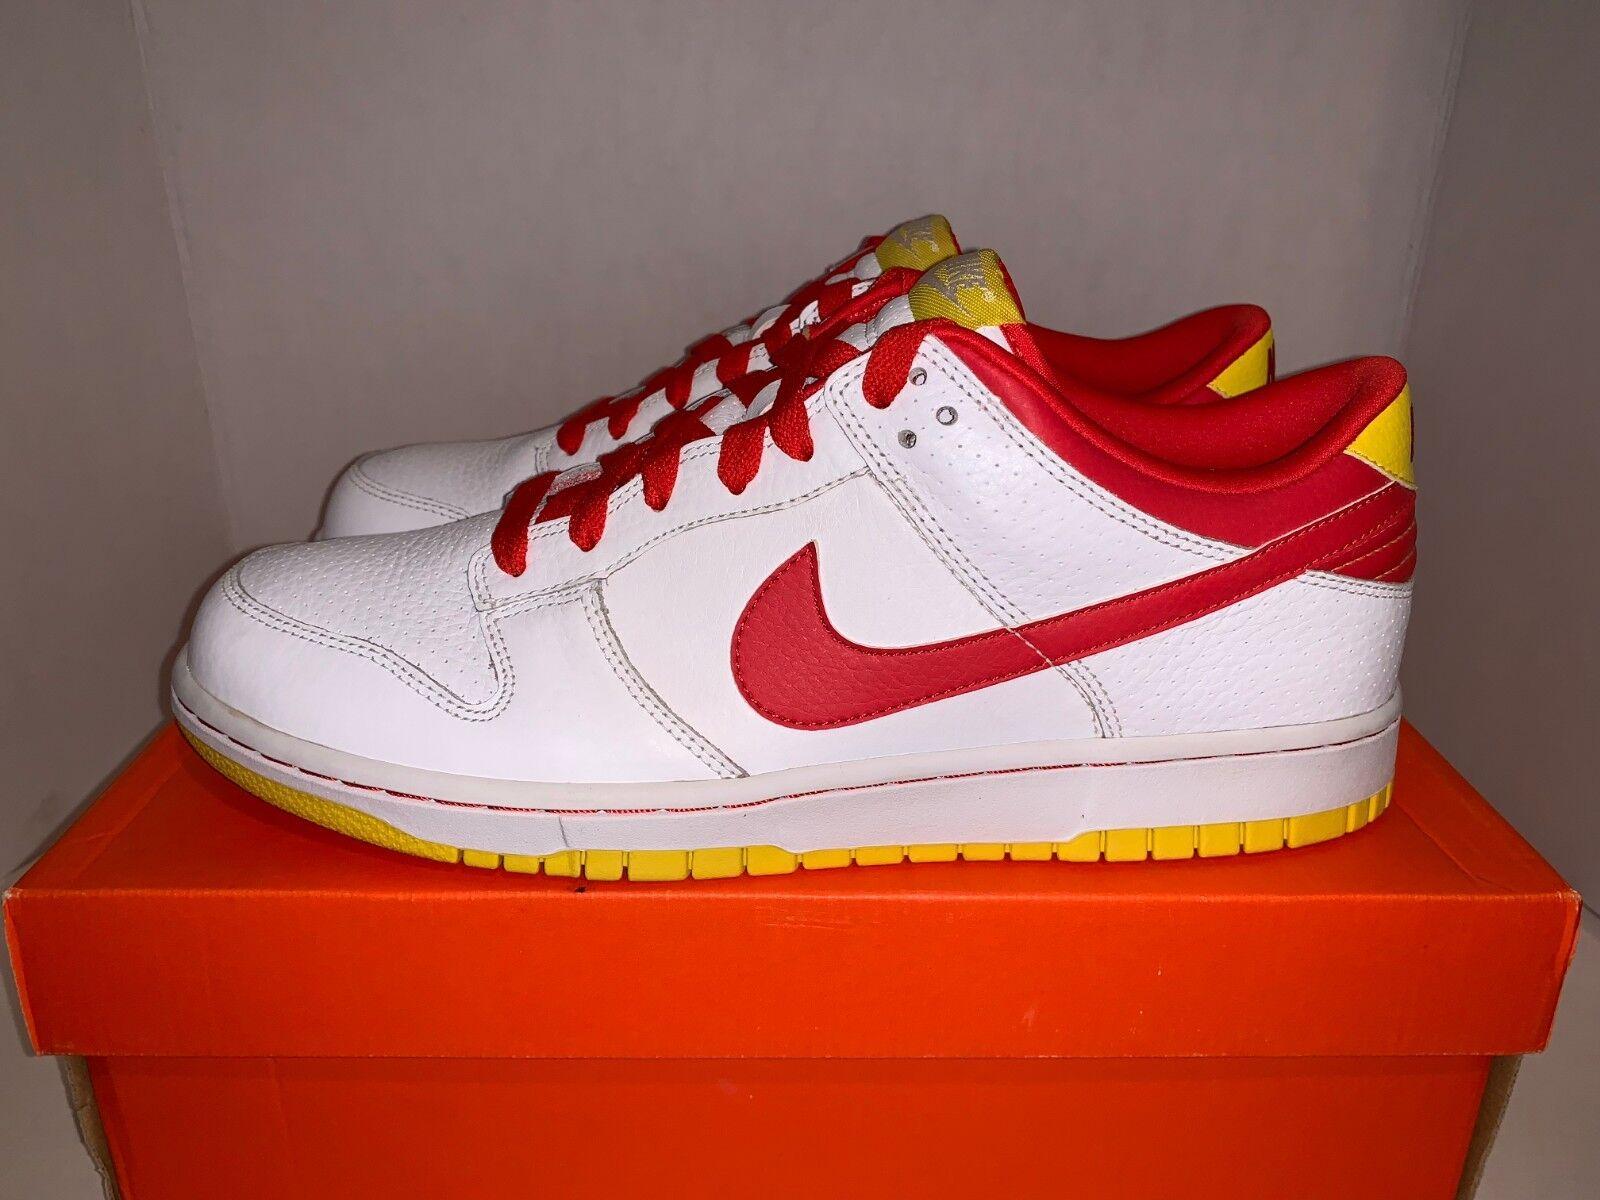 Nike dunk low low low nyx ronald - mcdonald - größe 11 ds 2008 330938 161 873ba2